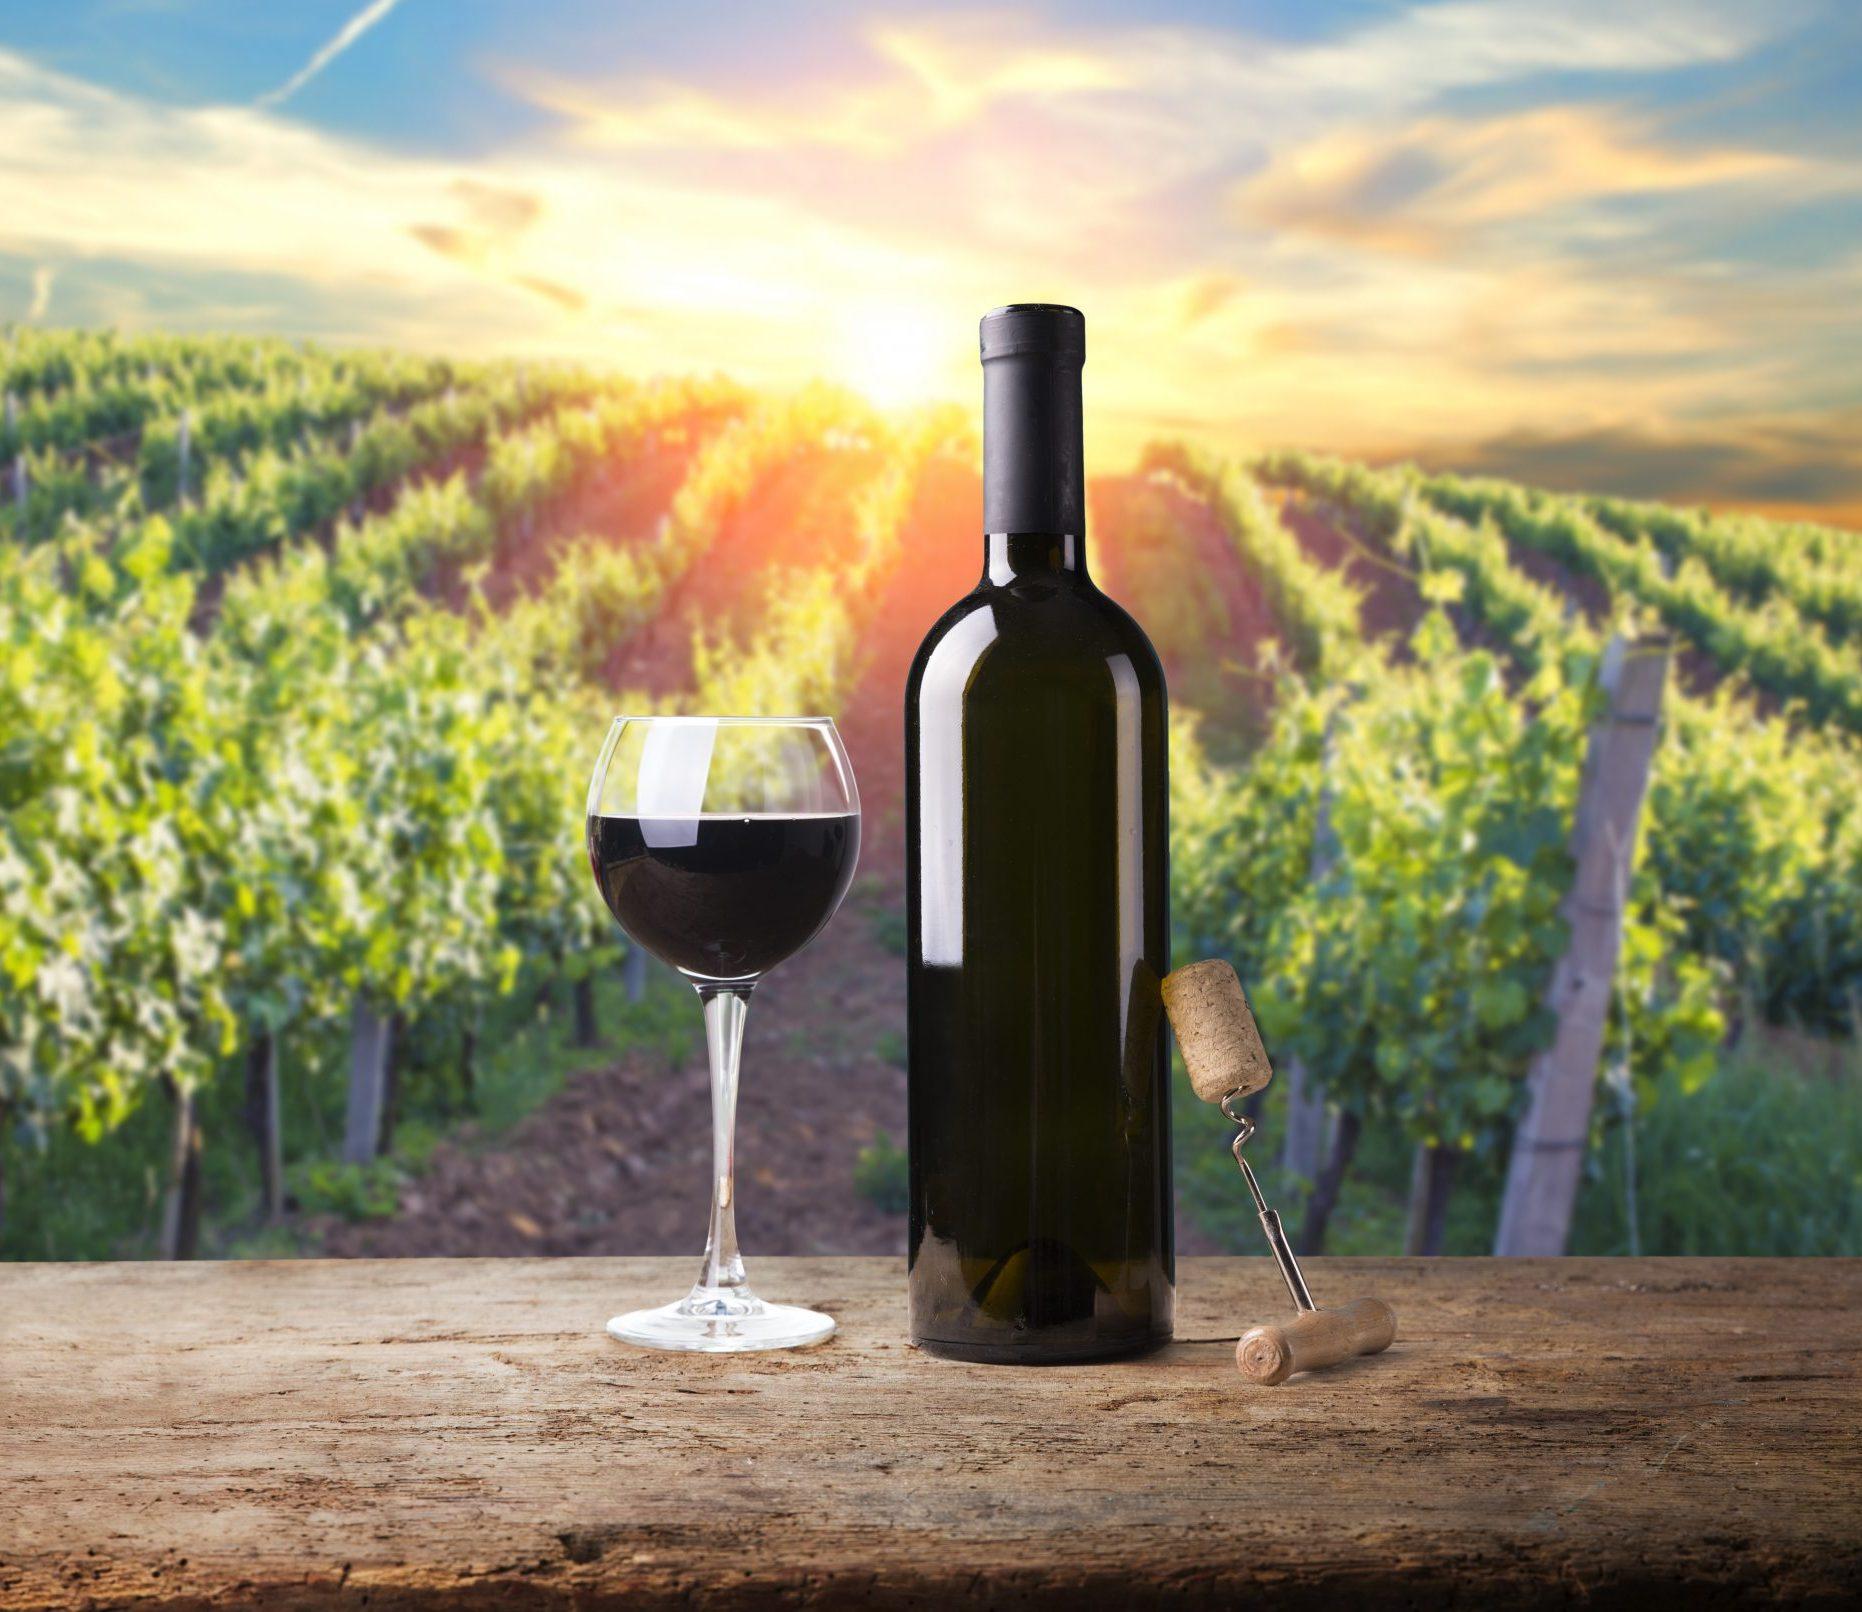 Extra wide panoramic shot of a summer vineyard shot at sunset